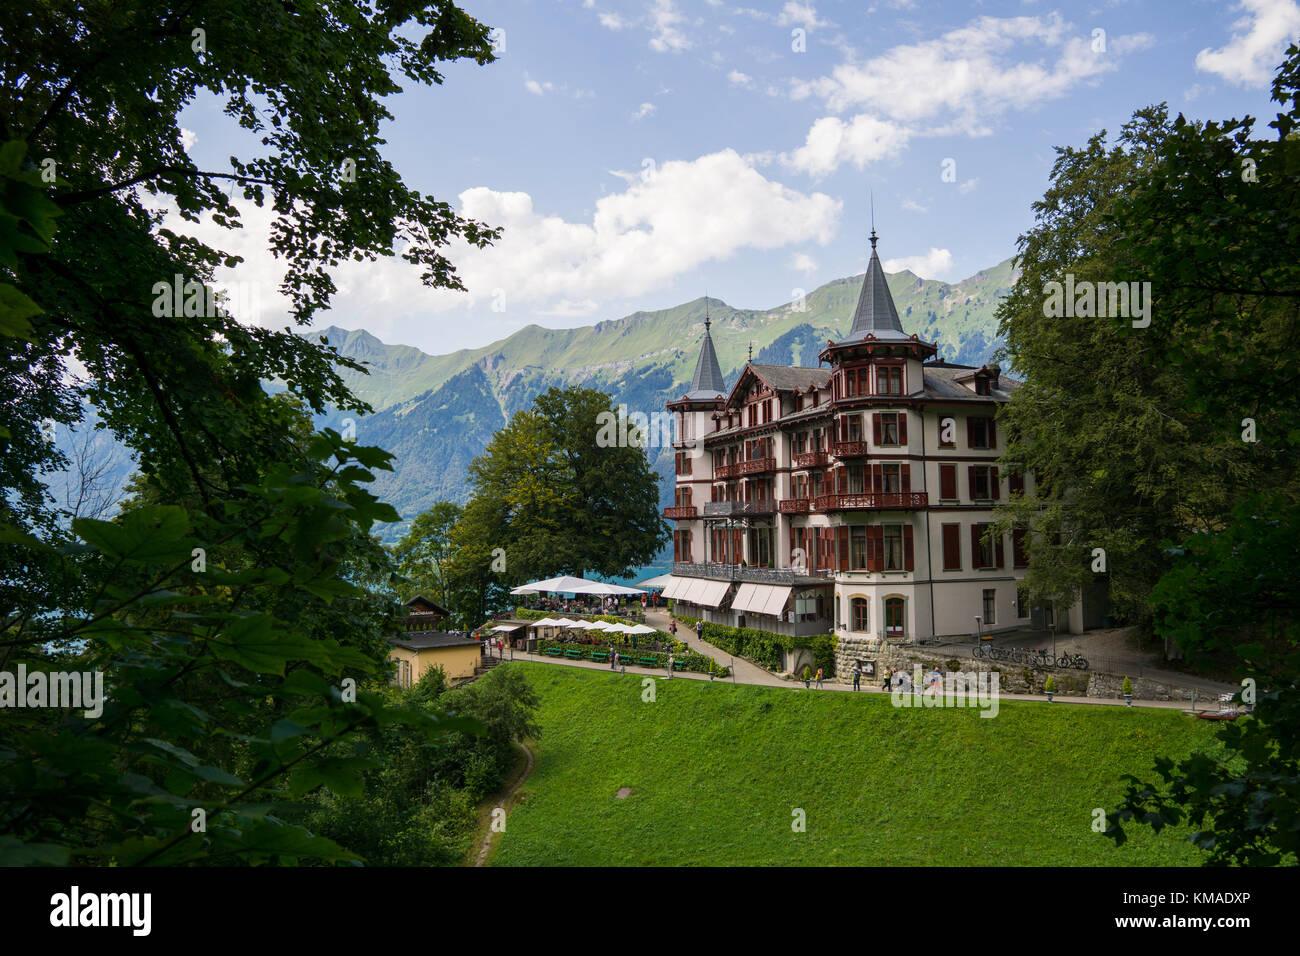 Grand Hotel Giessbach, Switzerland Stock Photo